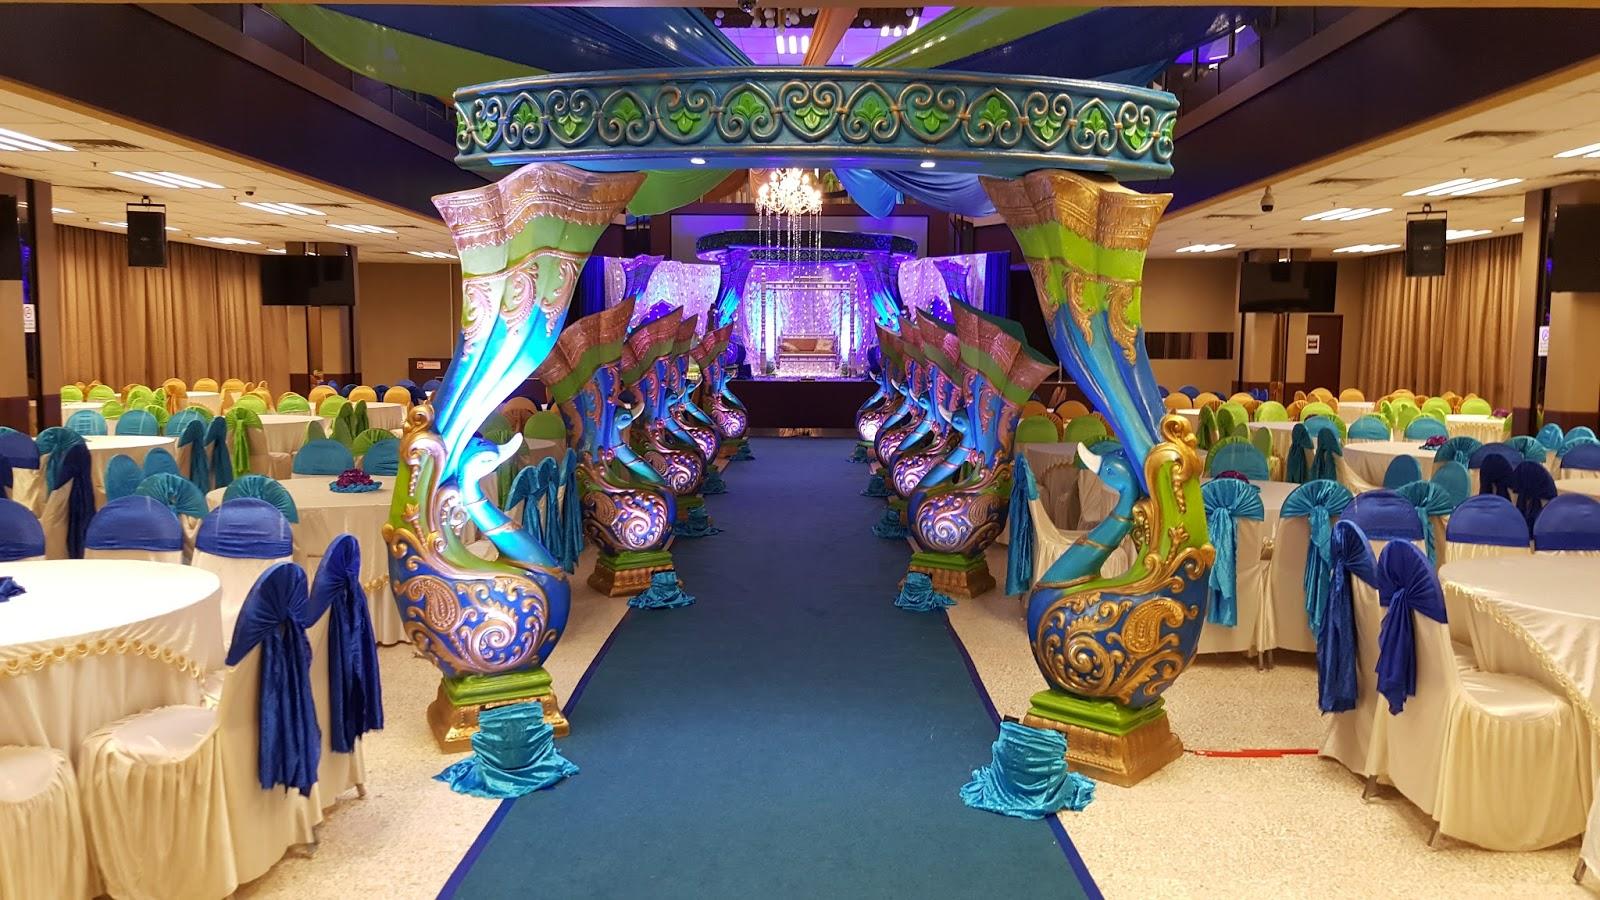 Km wedding services singapore indian brides contact km wedding services junglespirit Gallery